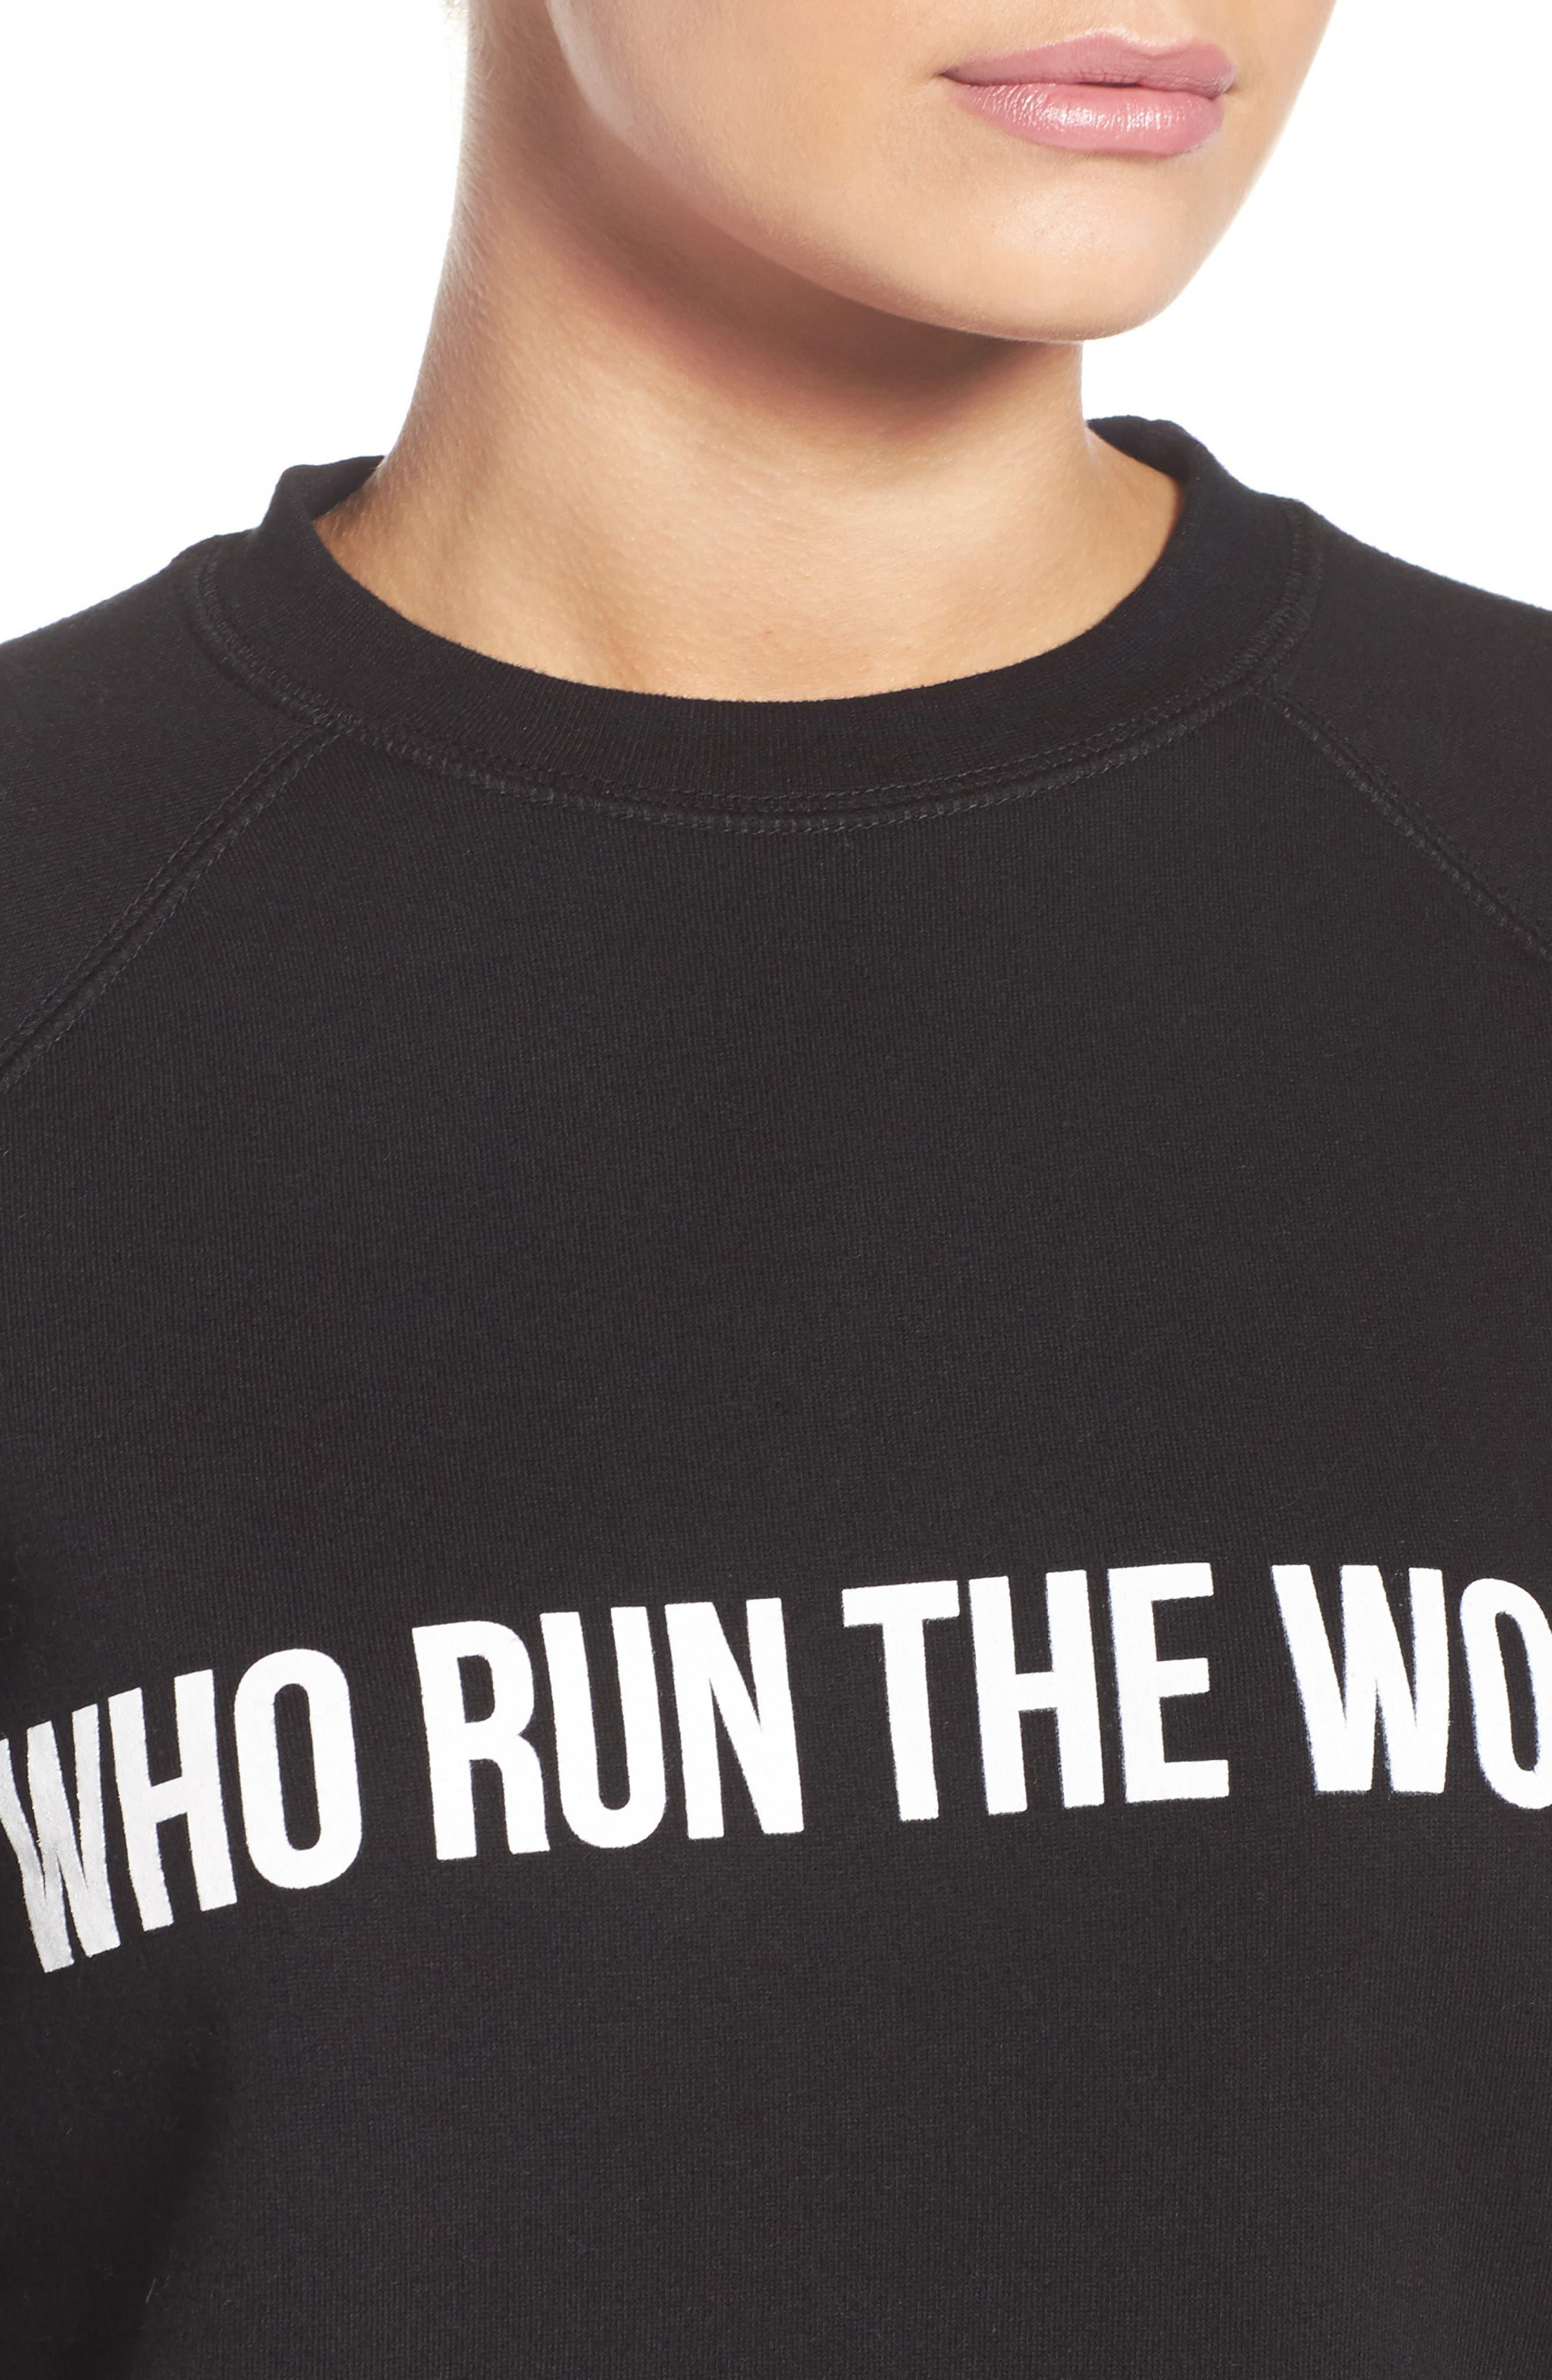 Who Run the World Sweatshirt,                             Alternate thumbnail 4, color,                             001